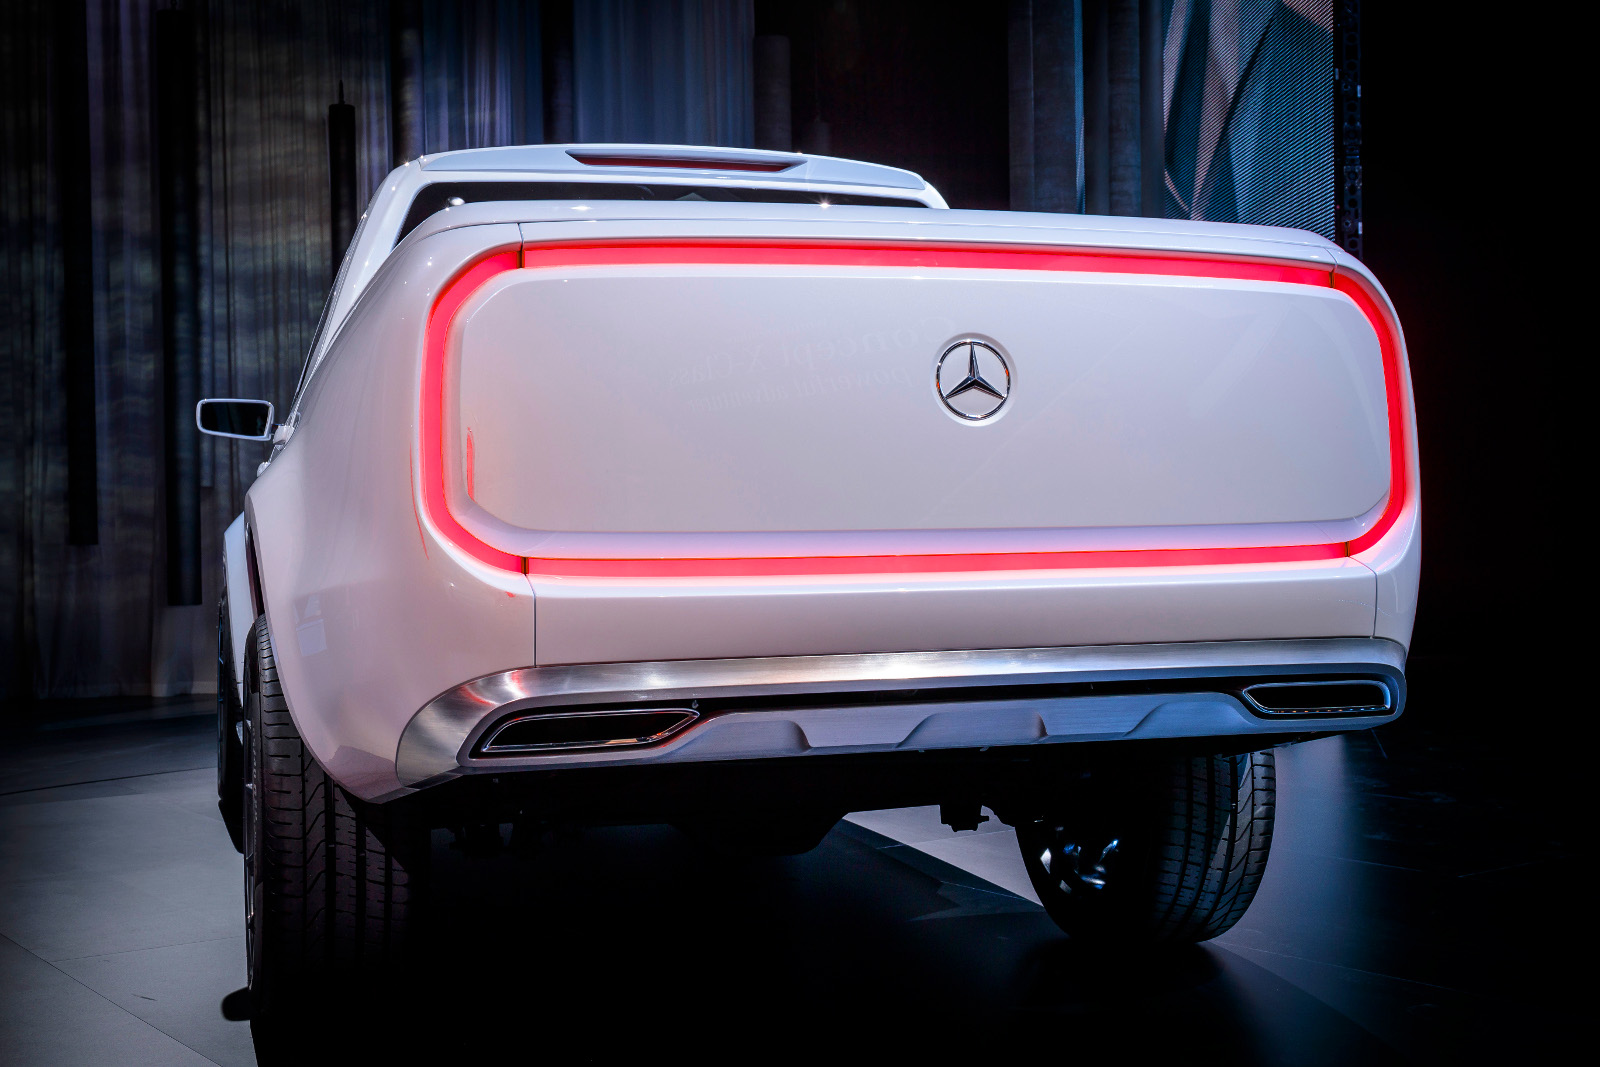 Mercedes-Benz - The Concept / Artipelag / Stockholm 2016